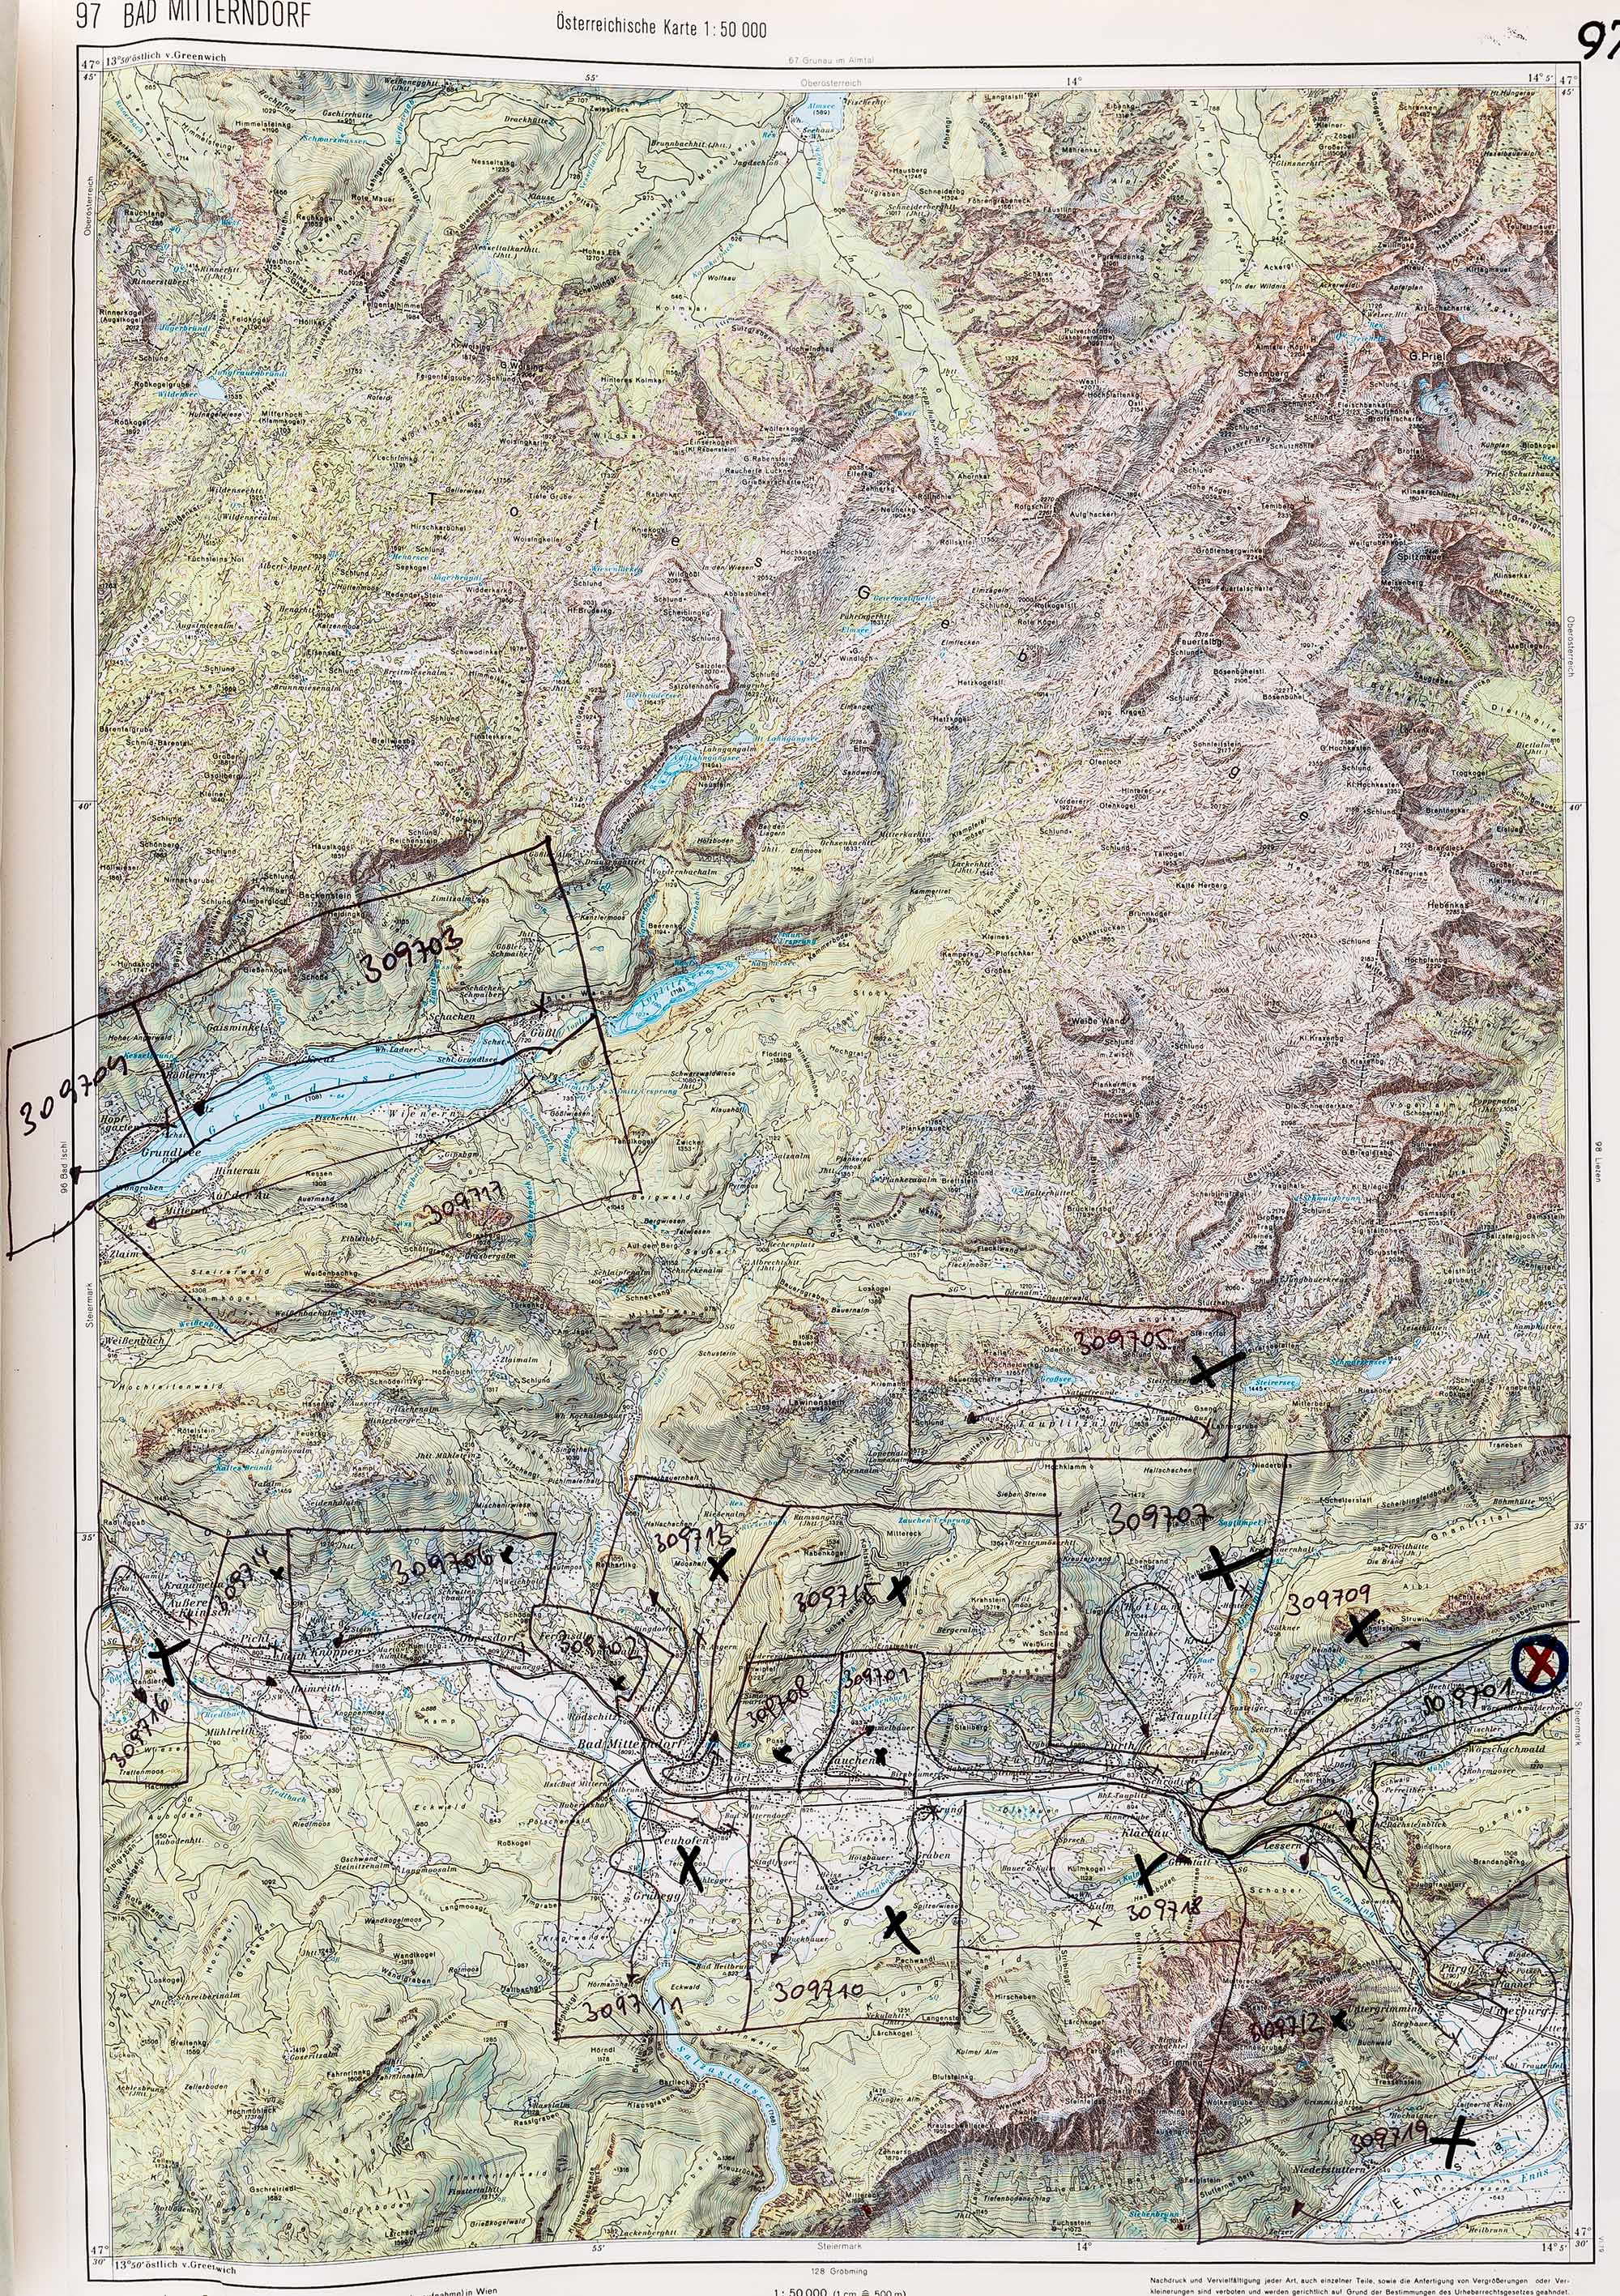 1983-1986 Karte 097